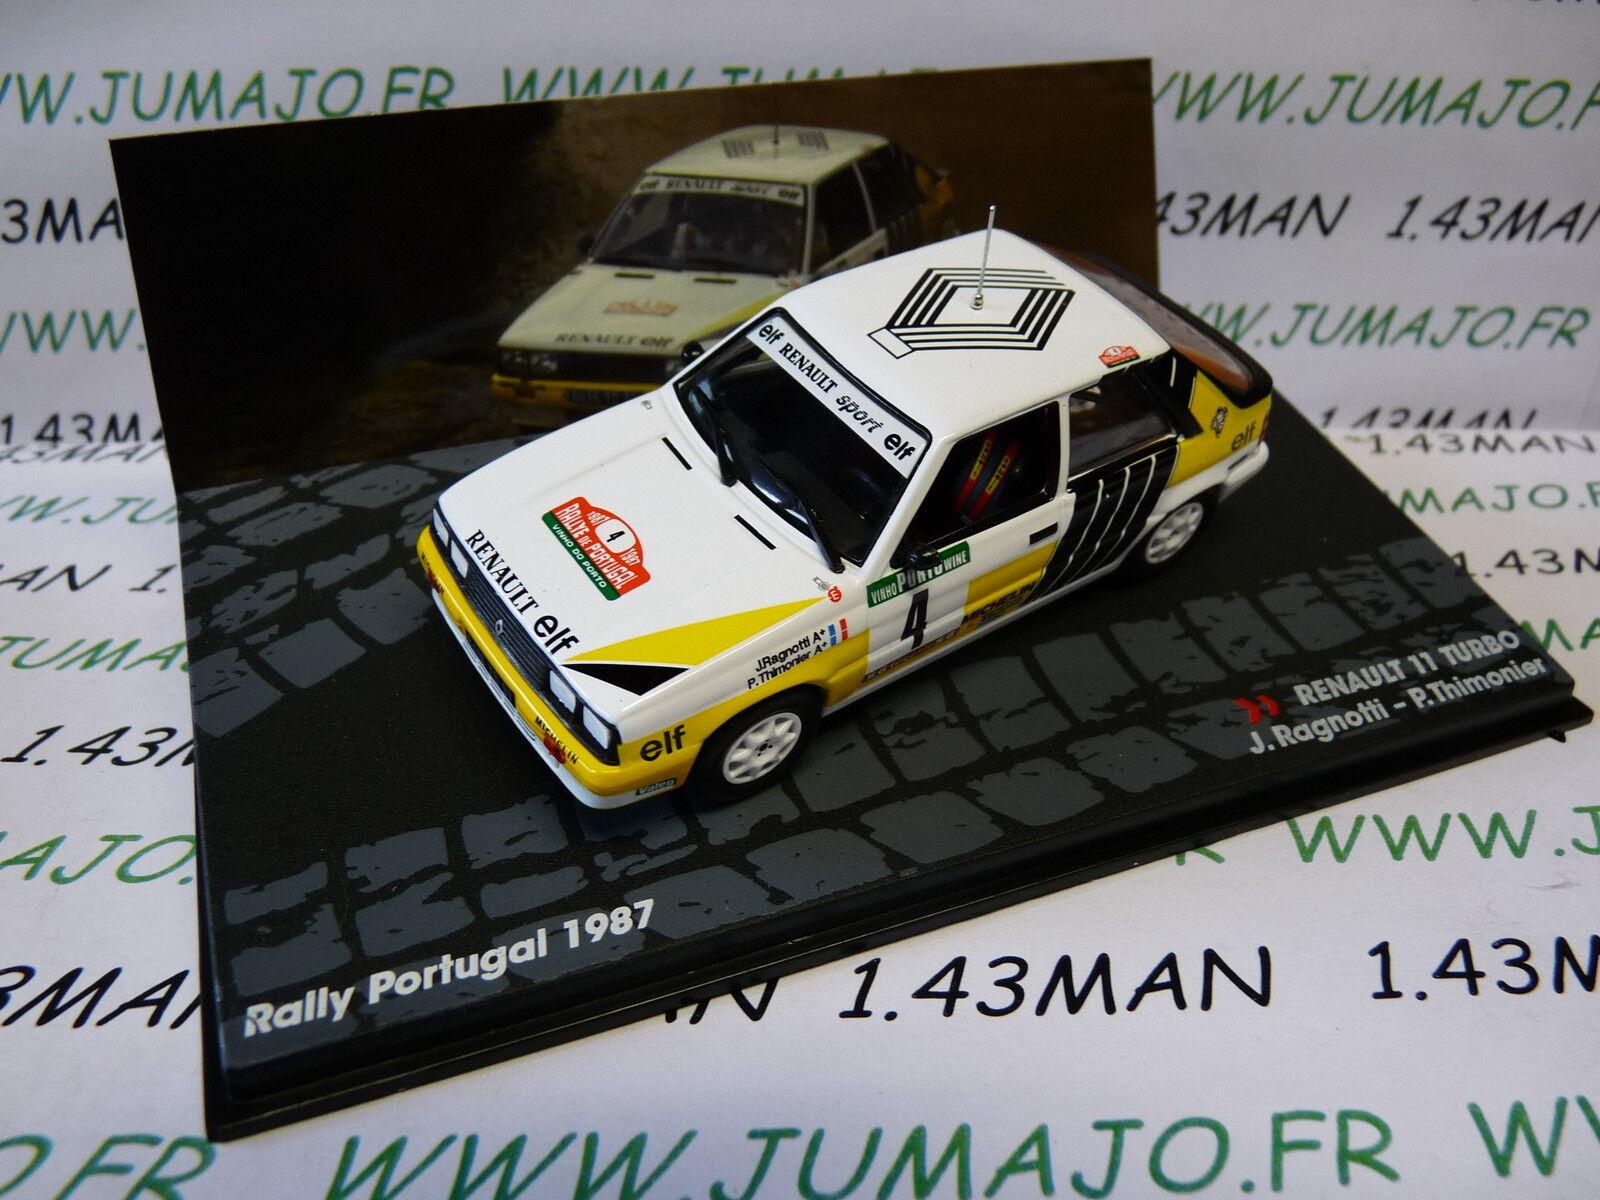 RIT1M voiture 1 43 IXO altaya Rallye PORTUGAL 1987   RENAULT 11 Turbo RAGNOTTI